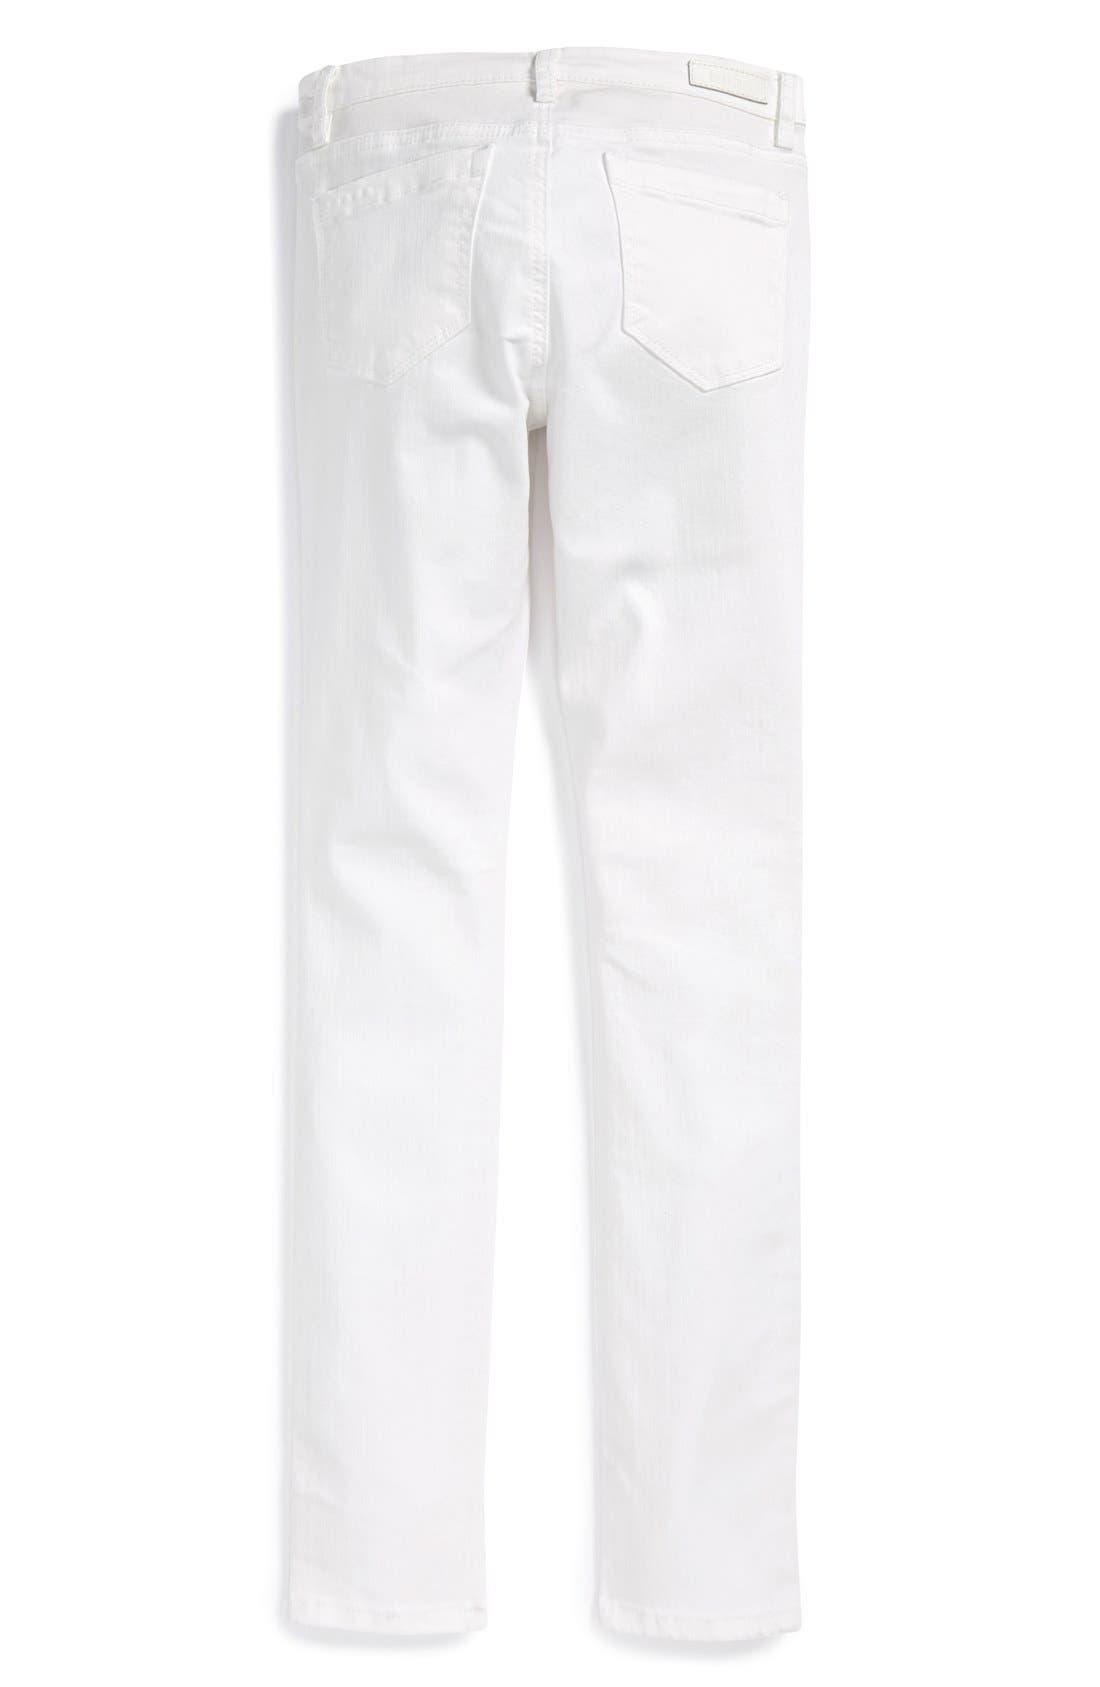 Stretch Denim Skinny Jeans,                             Alternate thumbnail 4, color,